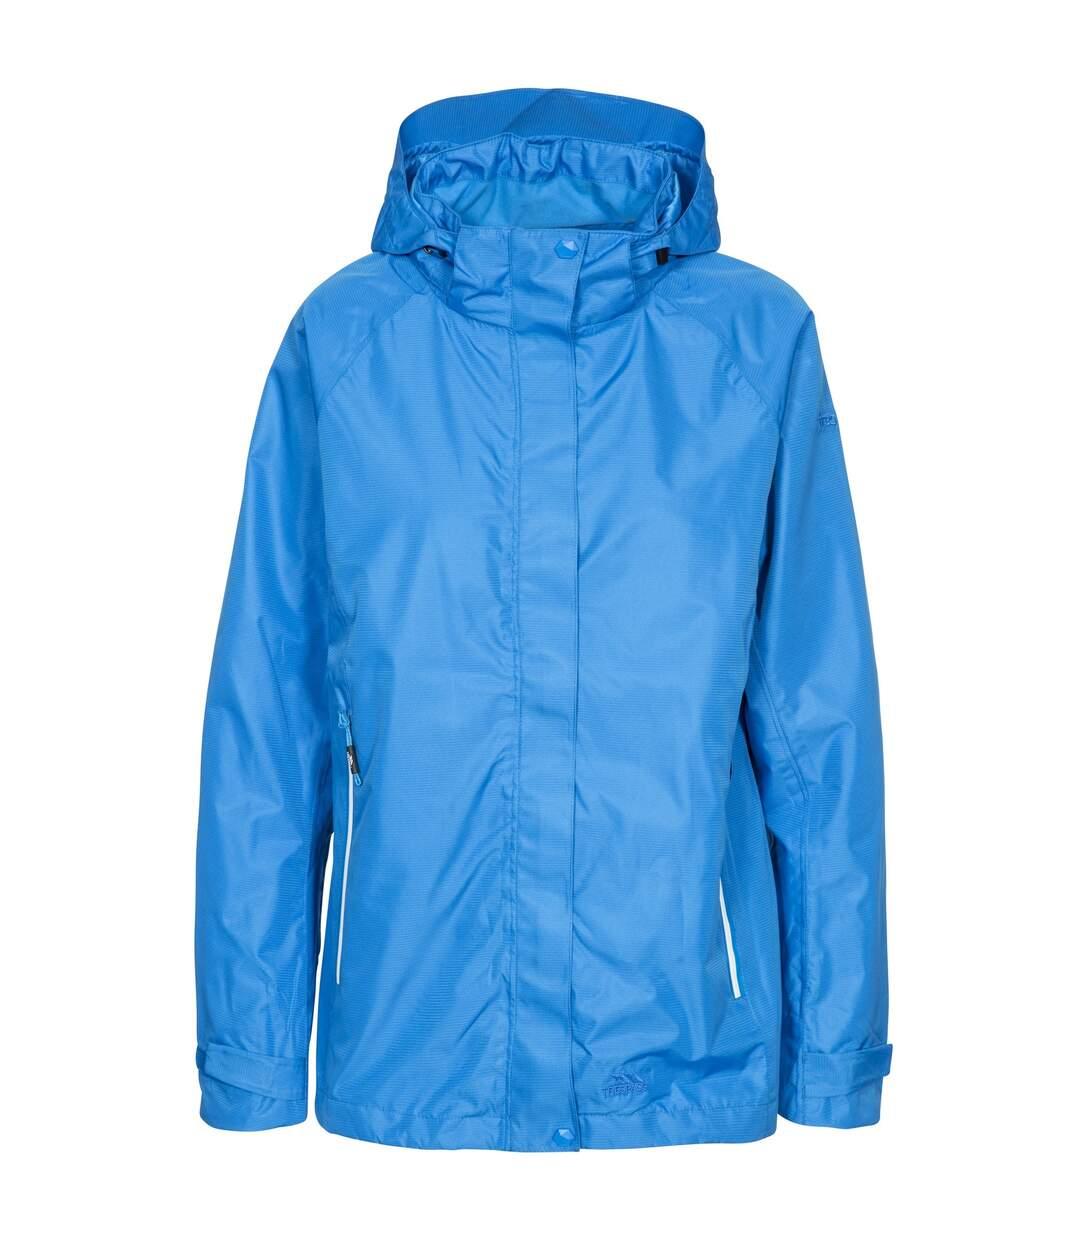 Trespass Womens/Ladies Review Waterproof Jacket (Vibrant Blue) - UTTP4617